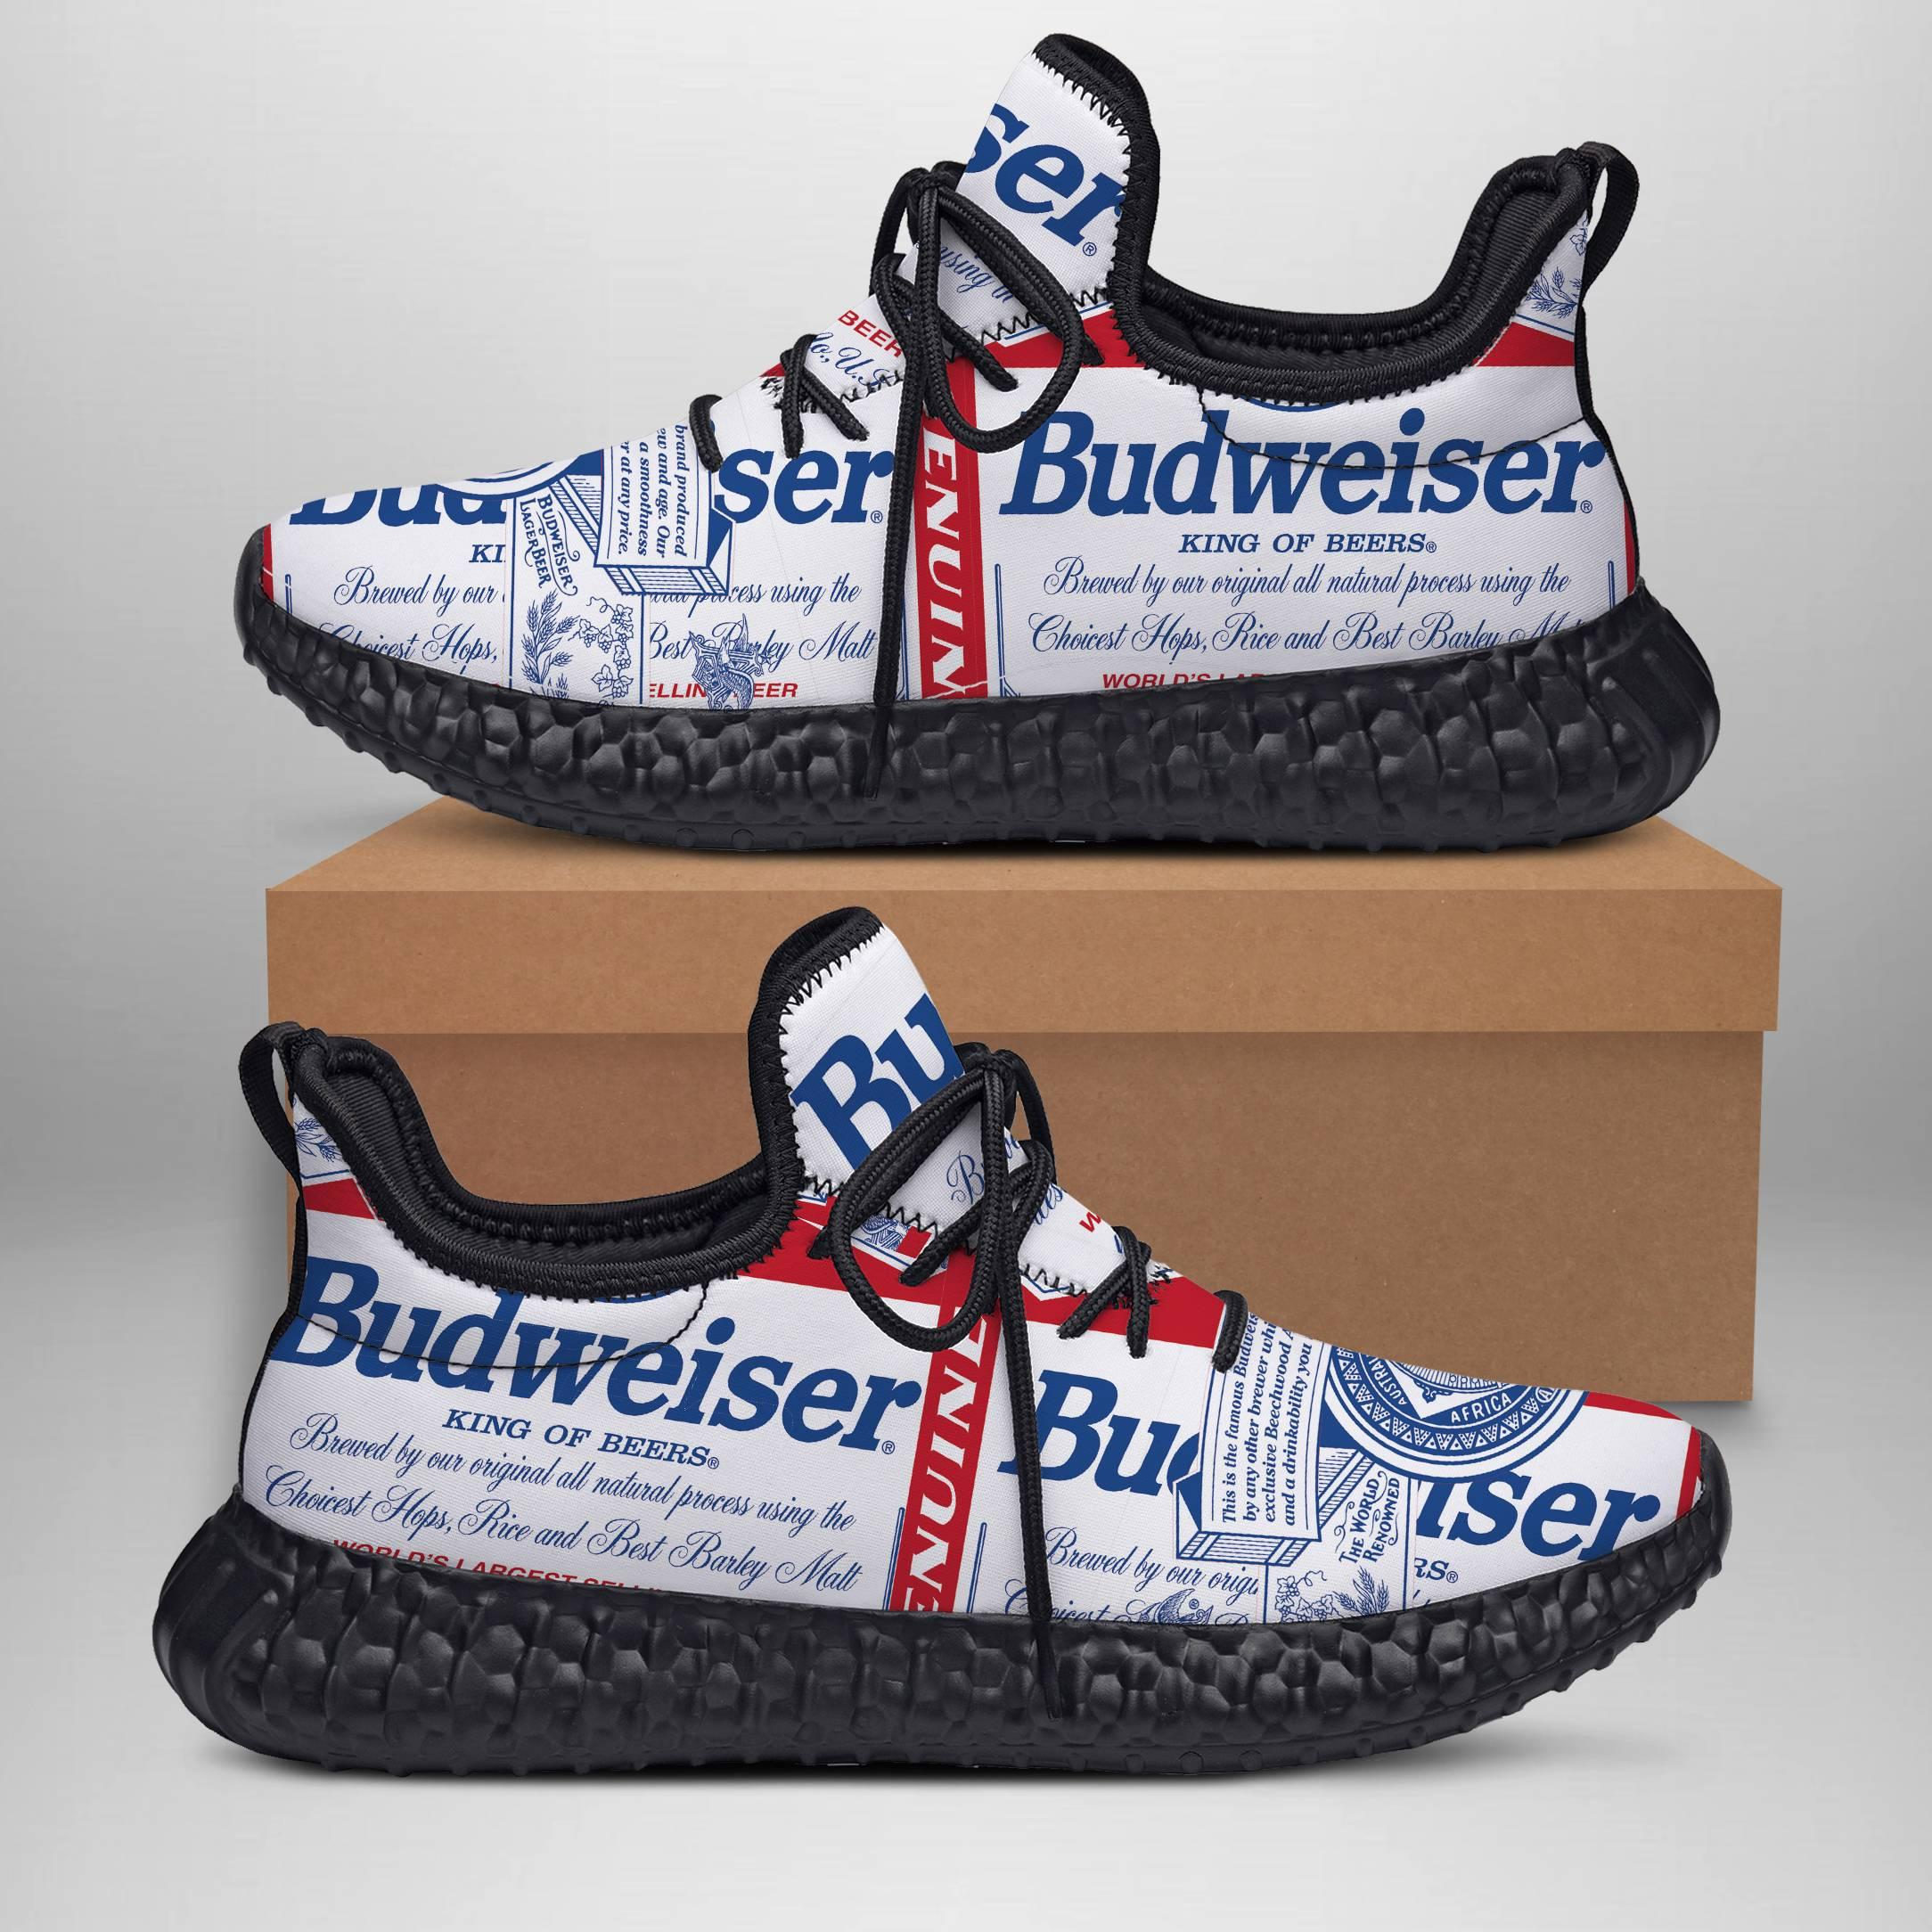 BUDWEISER  Yeezy Sneakers Shoes For Men, Women, Runing Yeezy Sneakers Shoes. Custom Yeezy Sneakers Shoes SNEAKERS